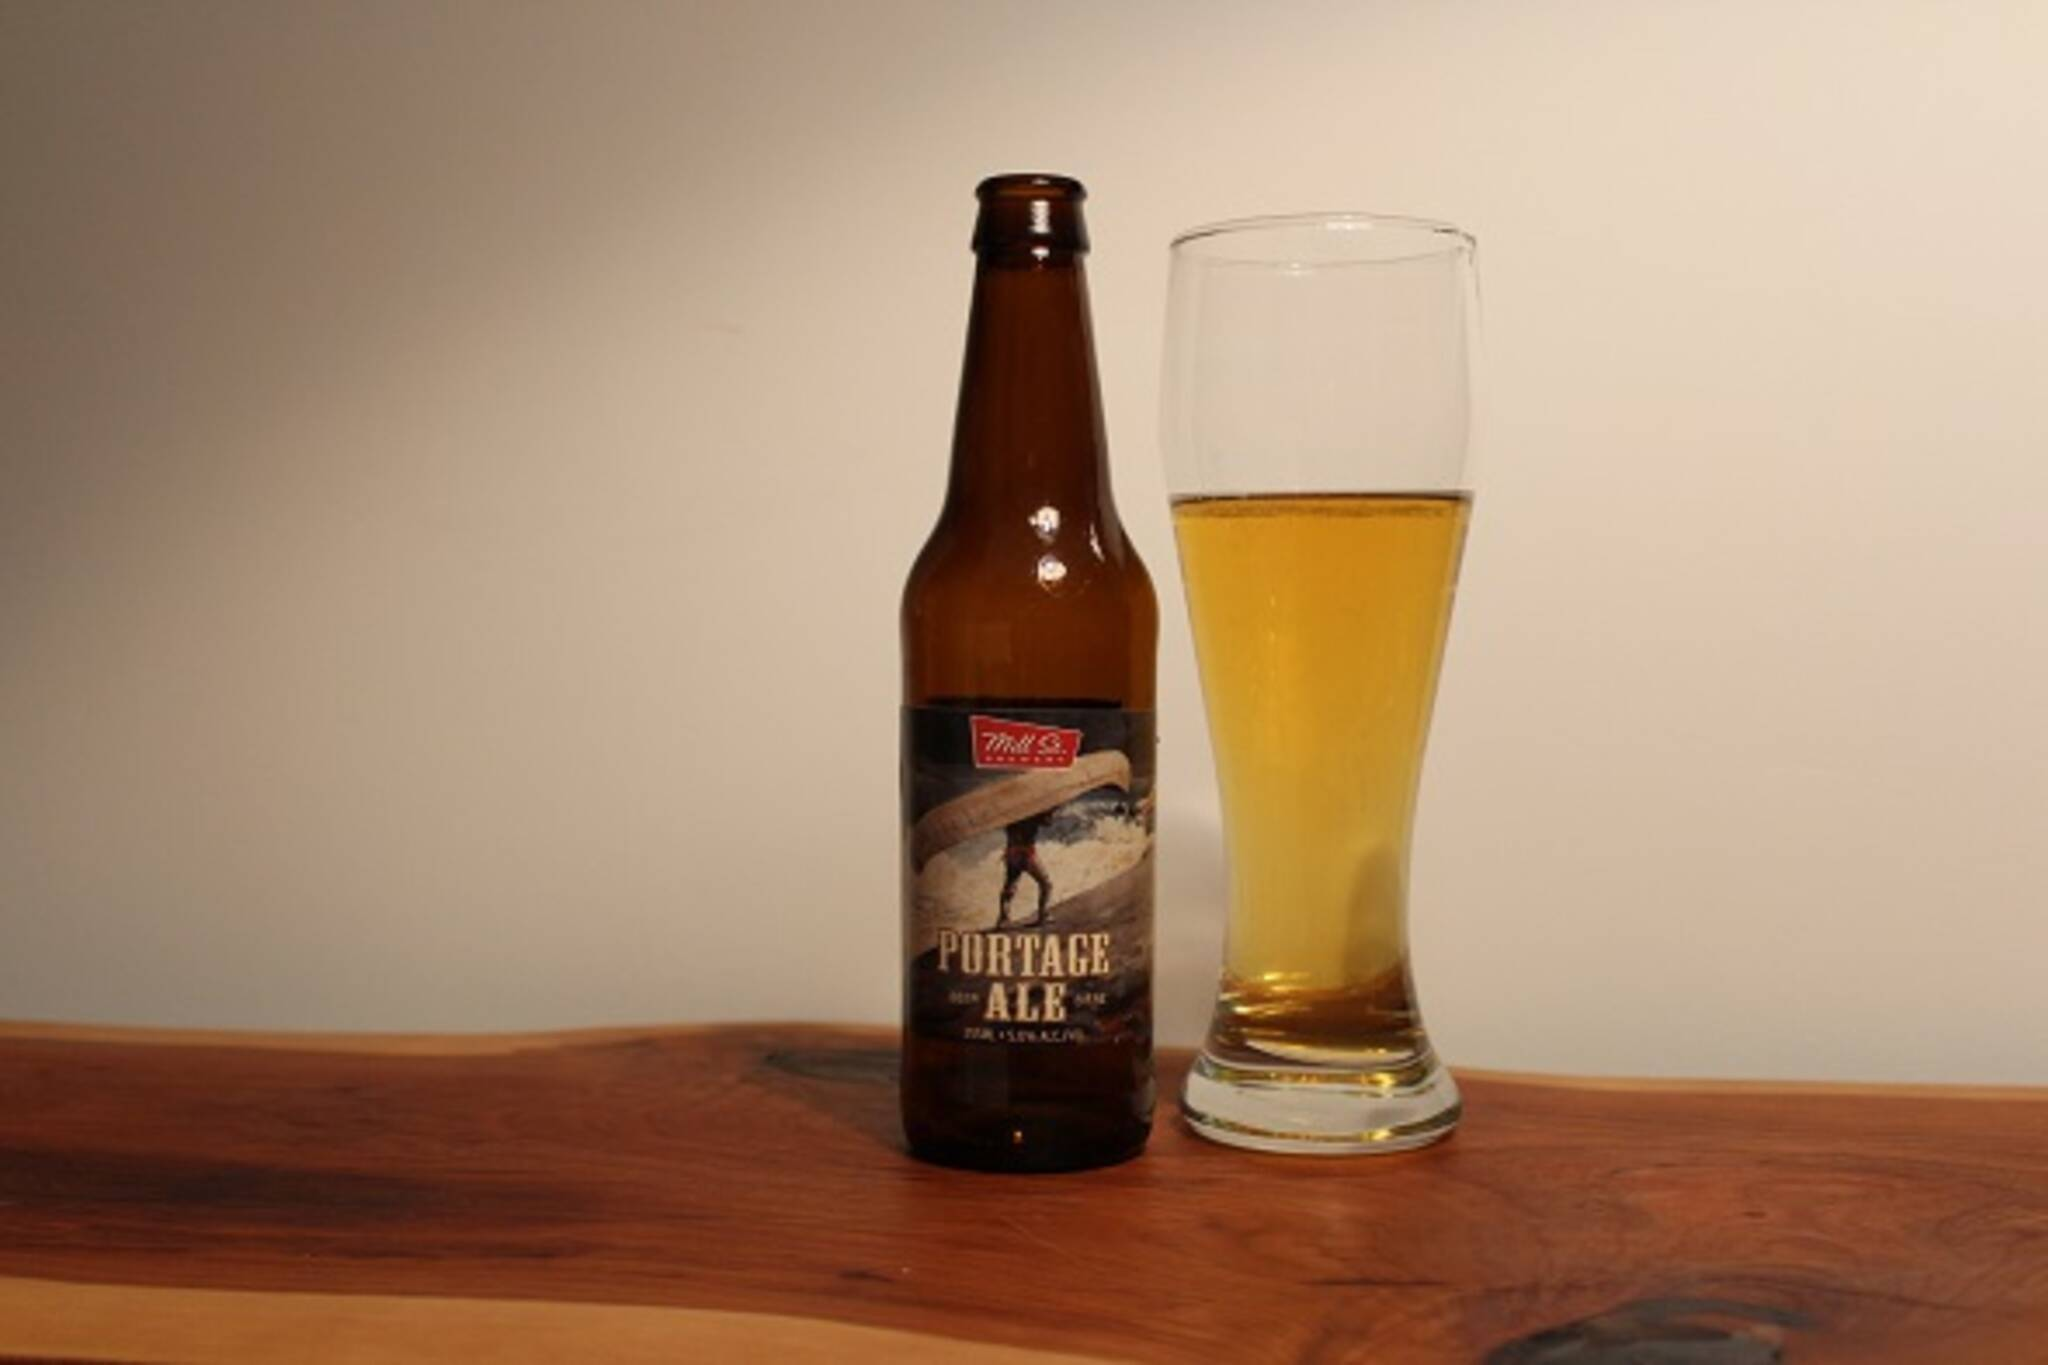 Mill Street Portage Ale